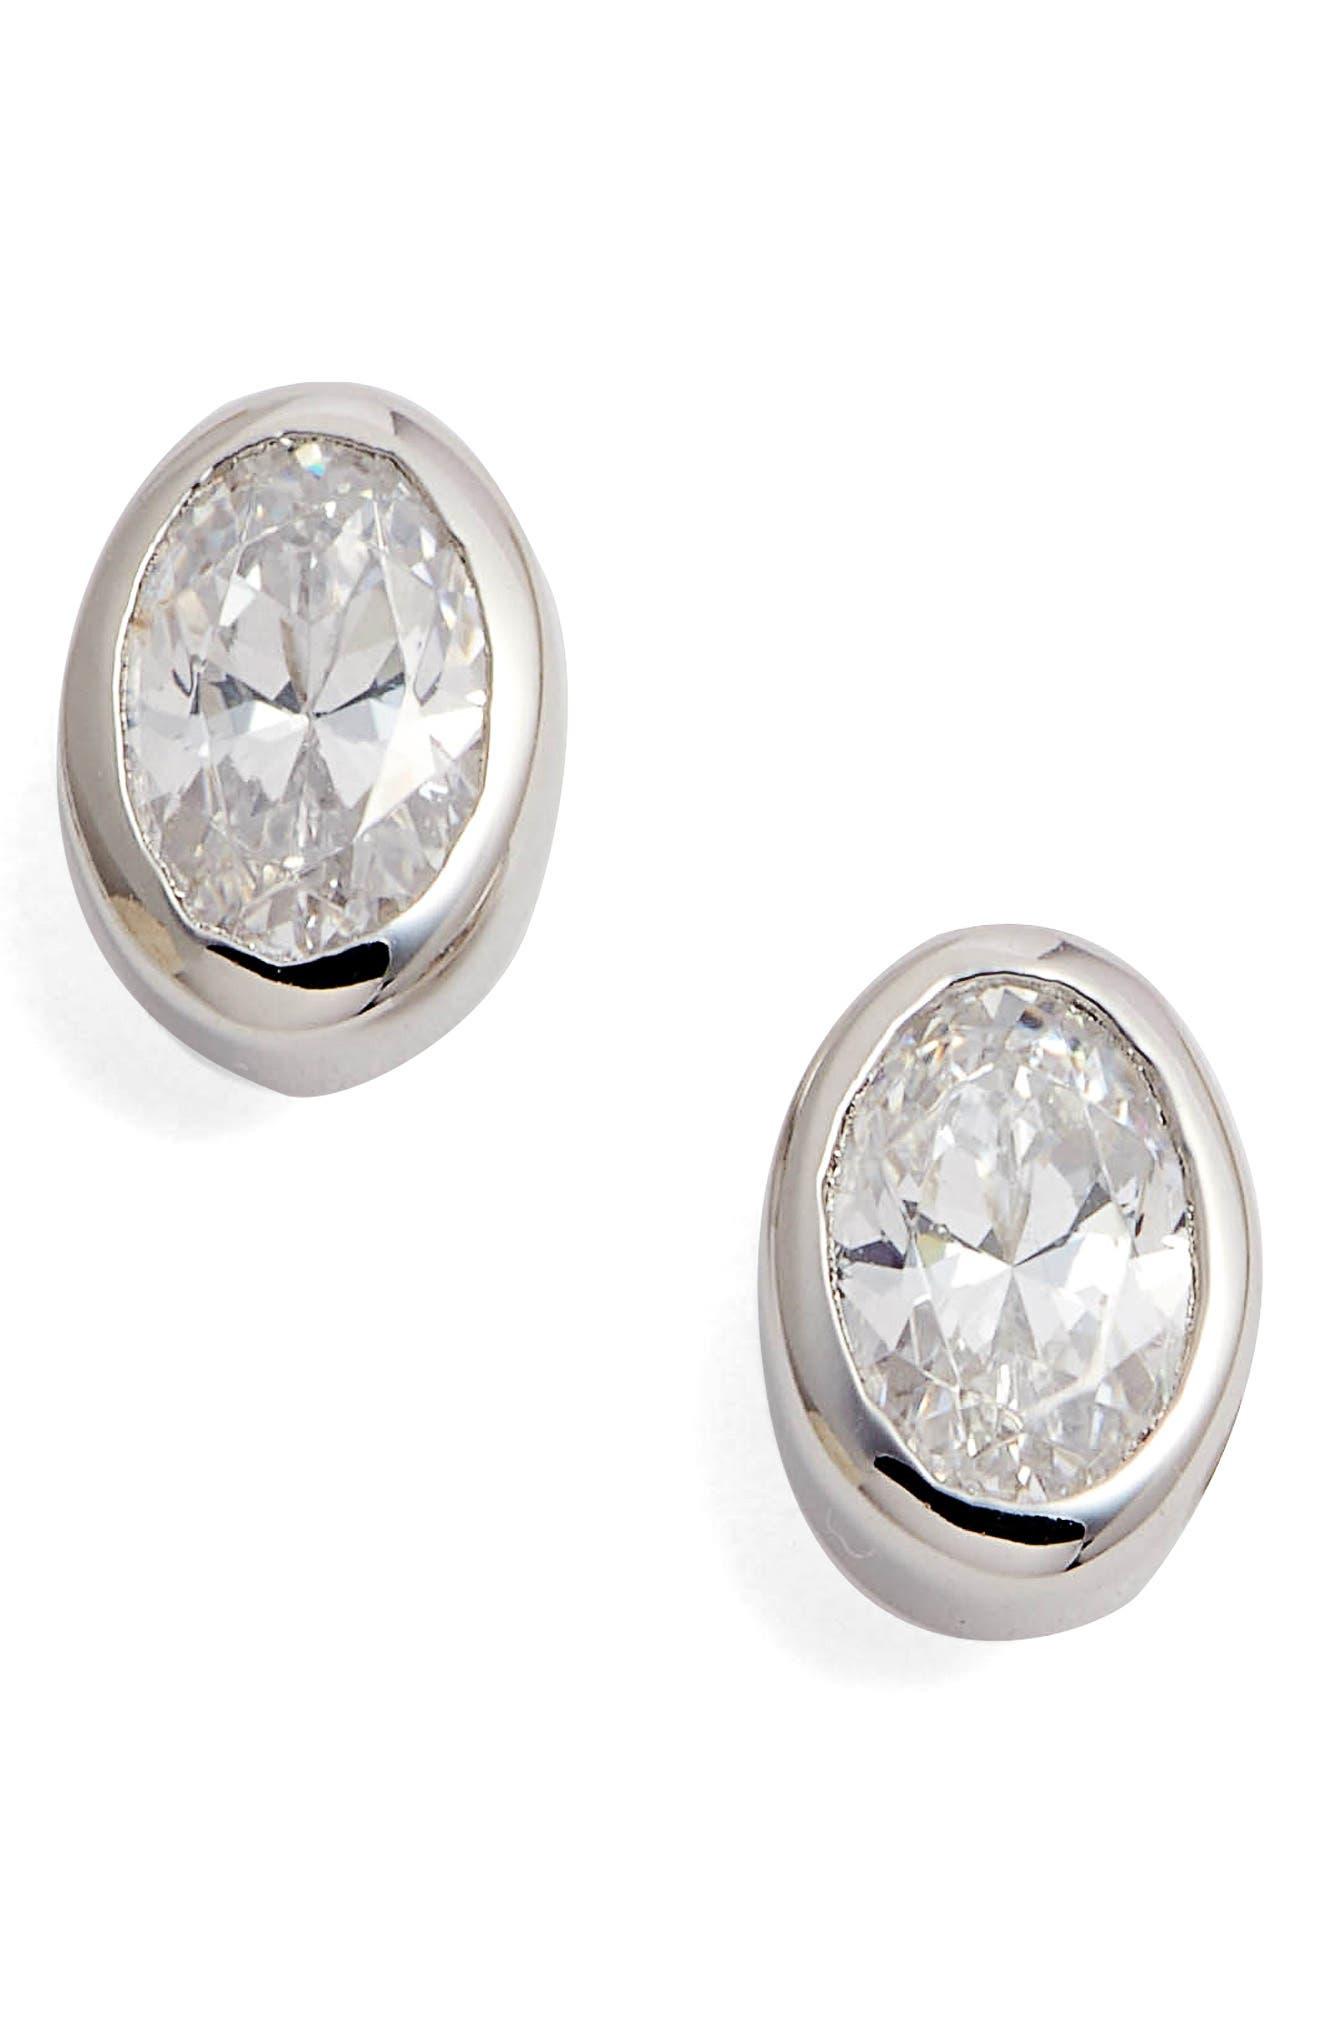 Bezel Set Oval Stud Earrings,                             Main thumbnail 1, color,                             SILVER/ CLEAR